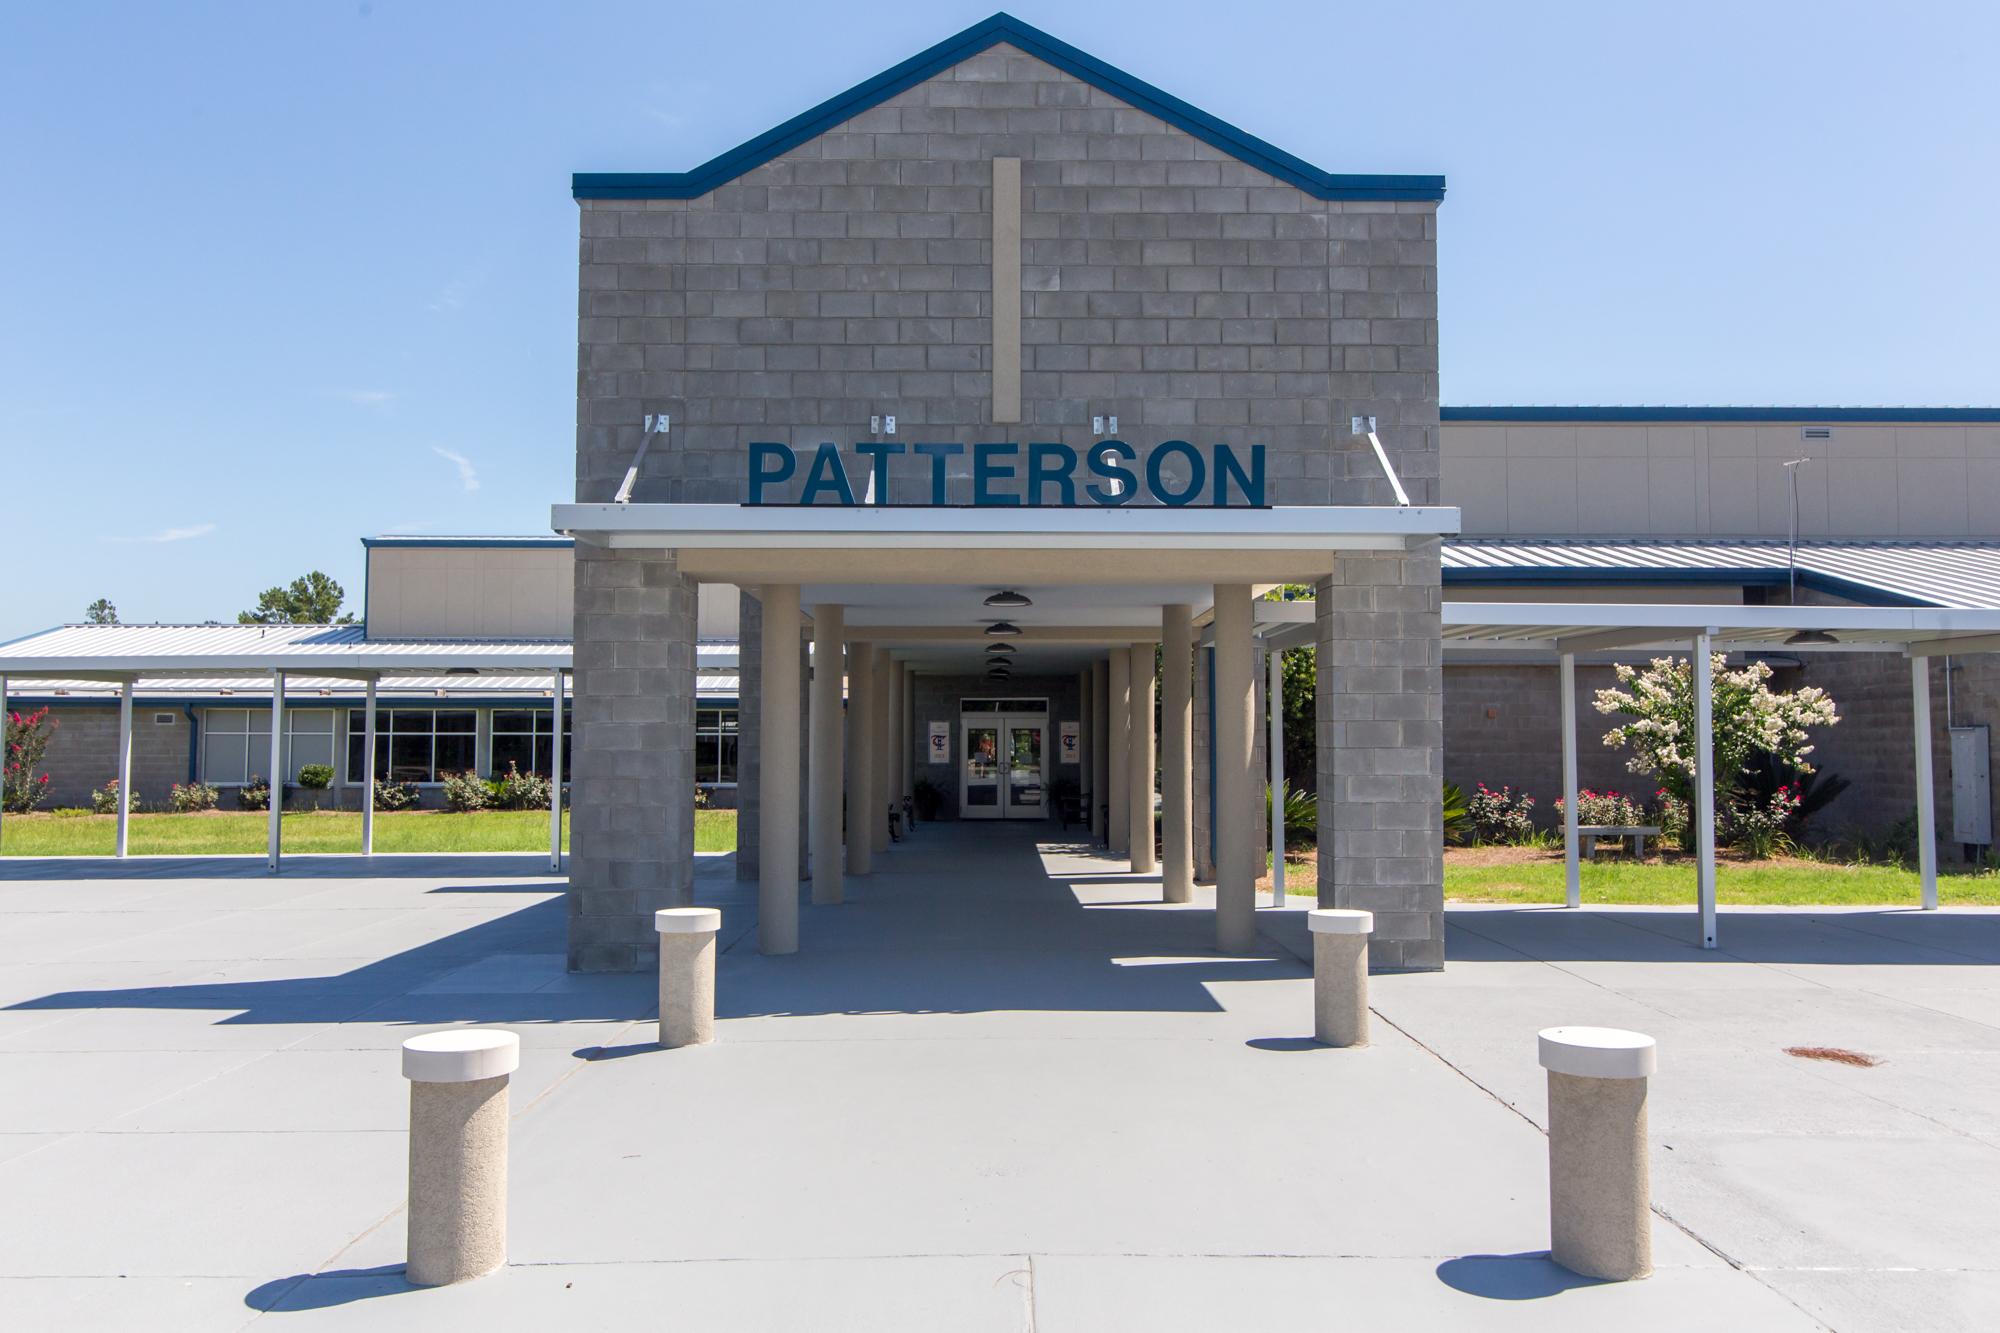 Patterson (19)